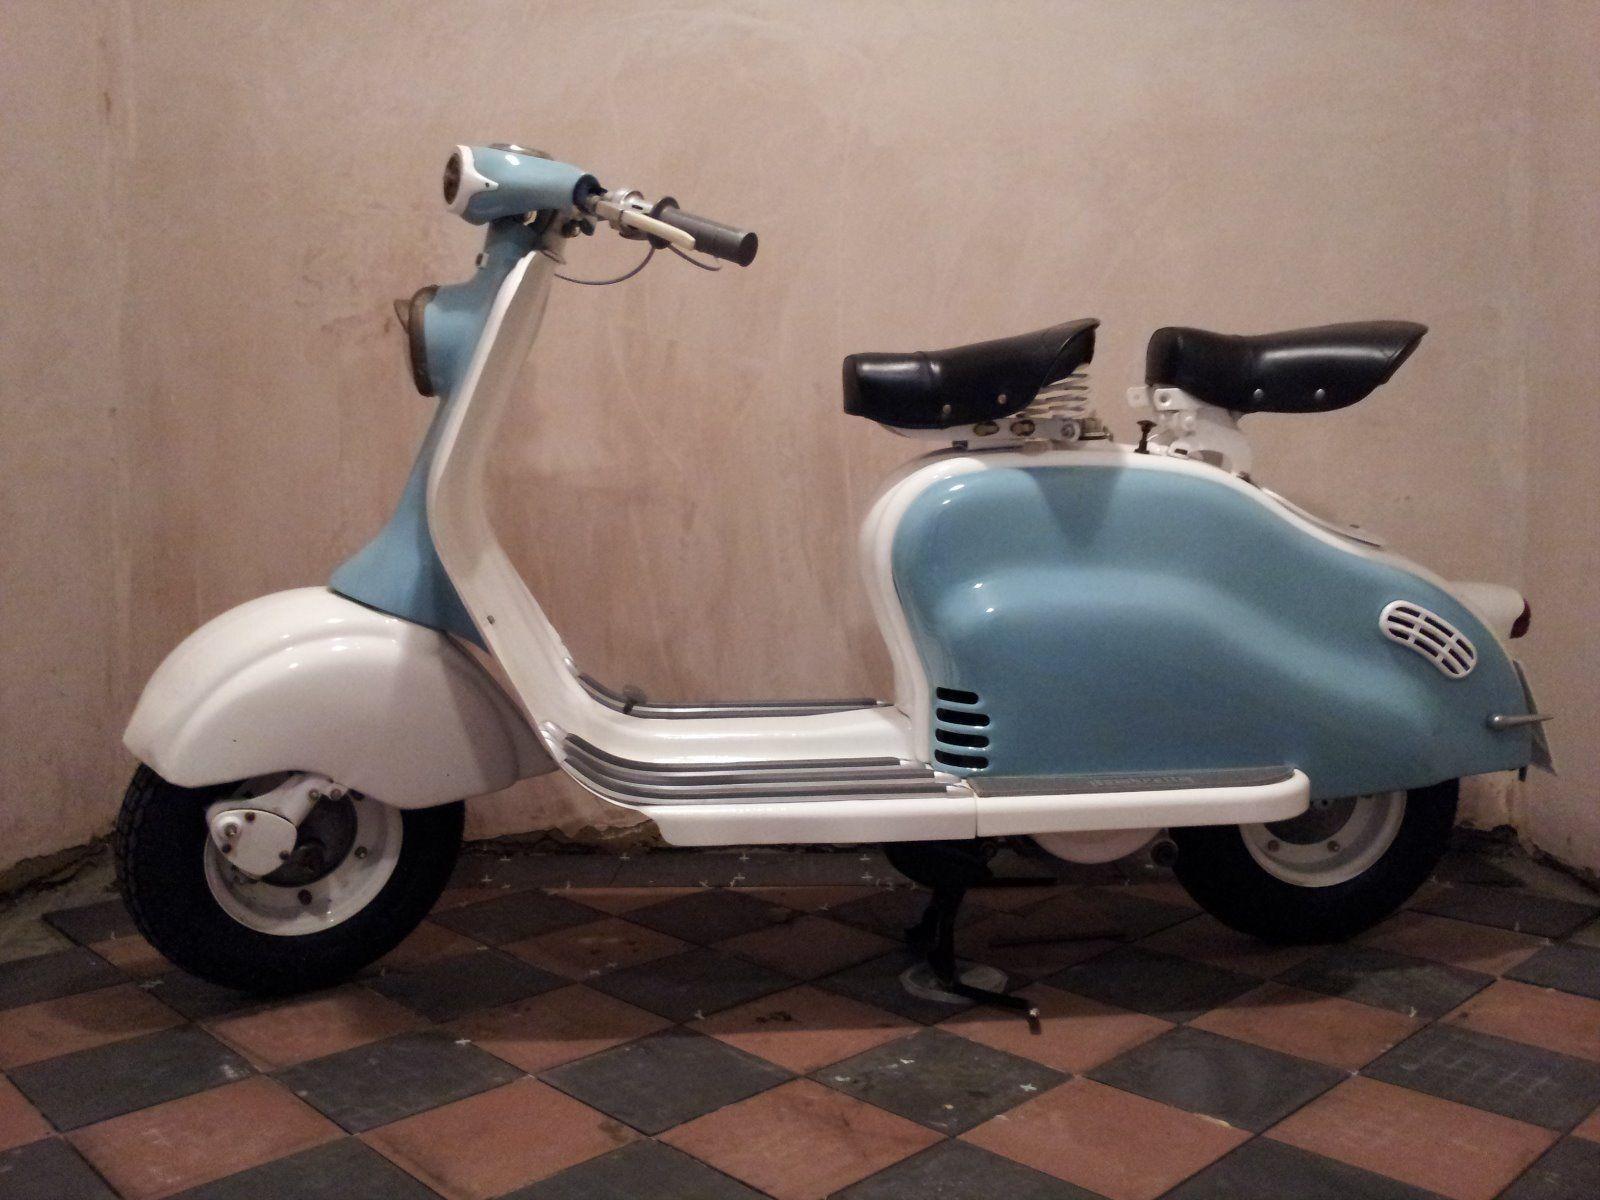 lambretta ld 150 1957 motos pinterest. Black Bedroom Furniture Sets. Home Design Ideas